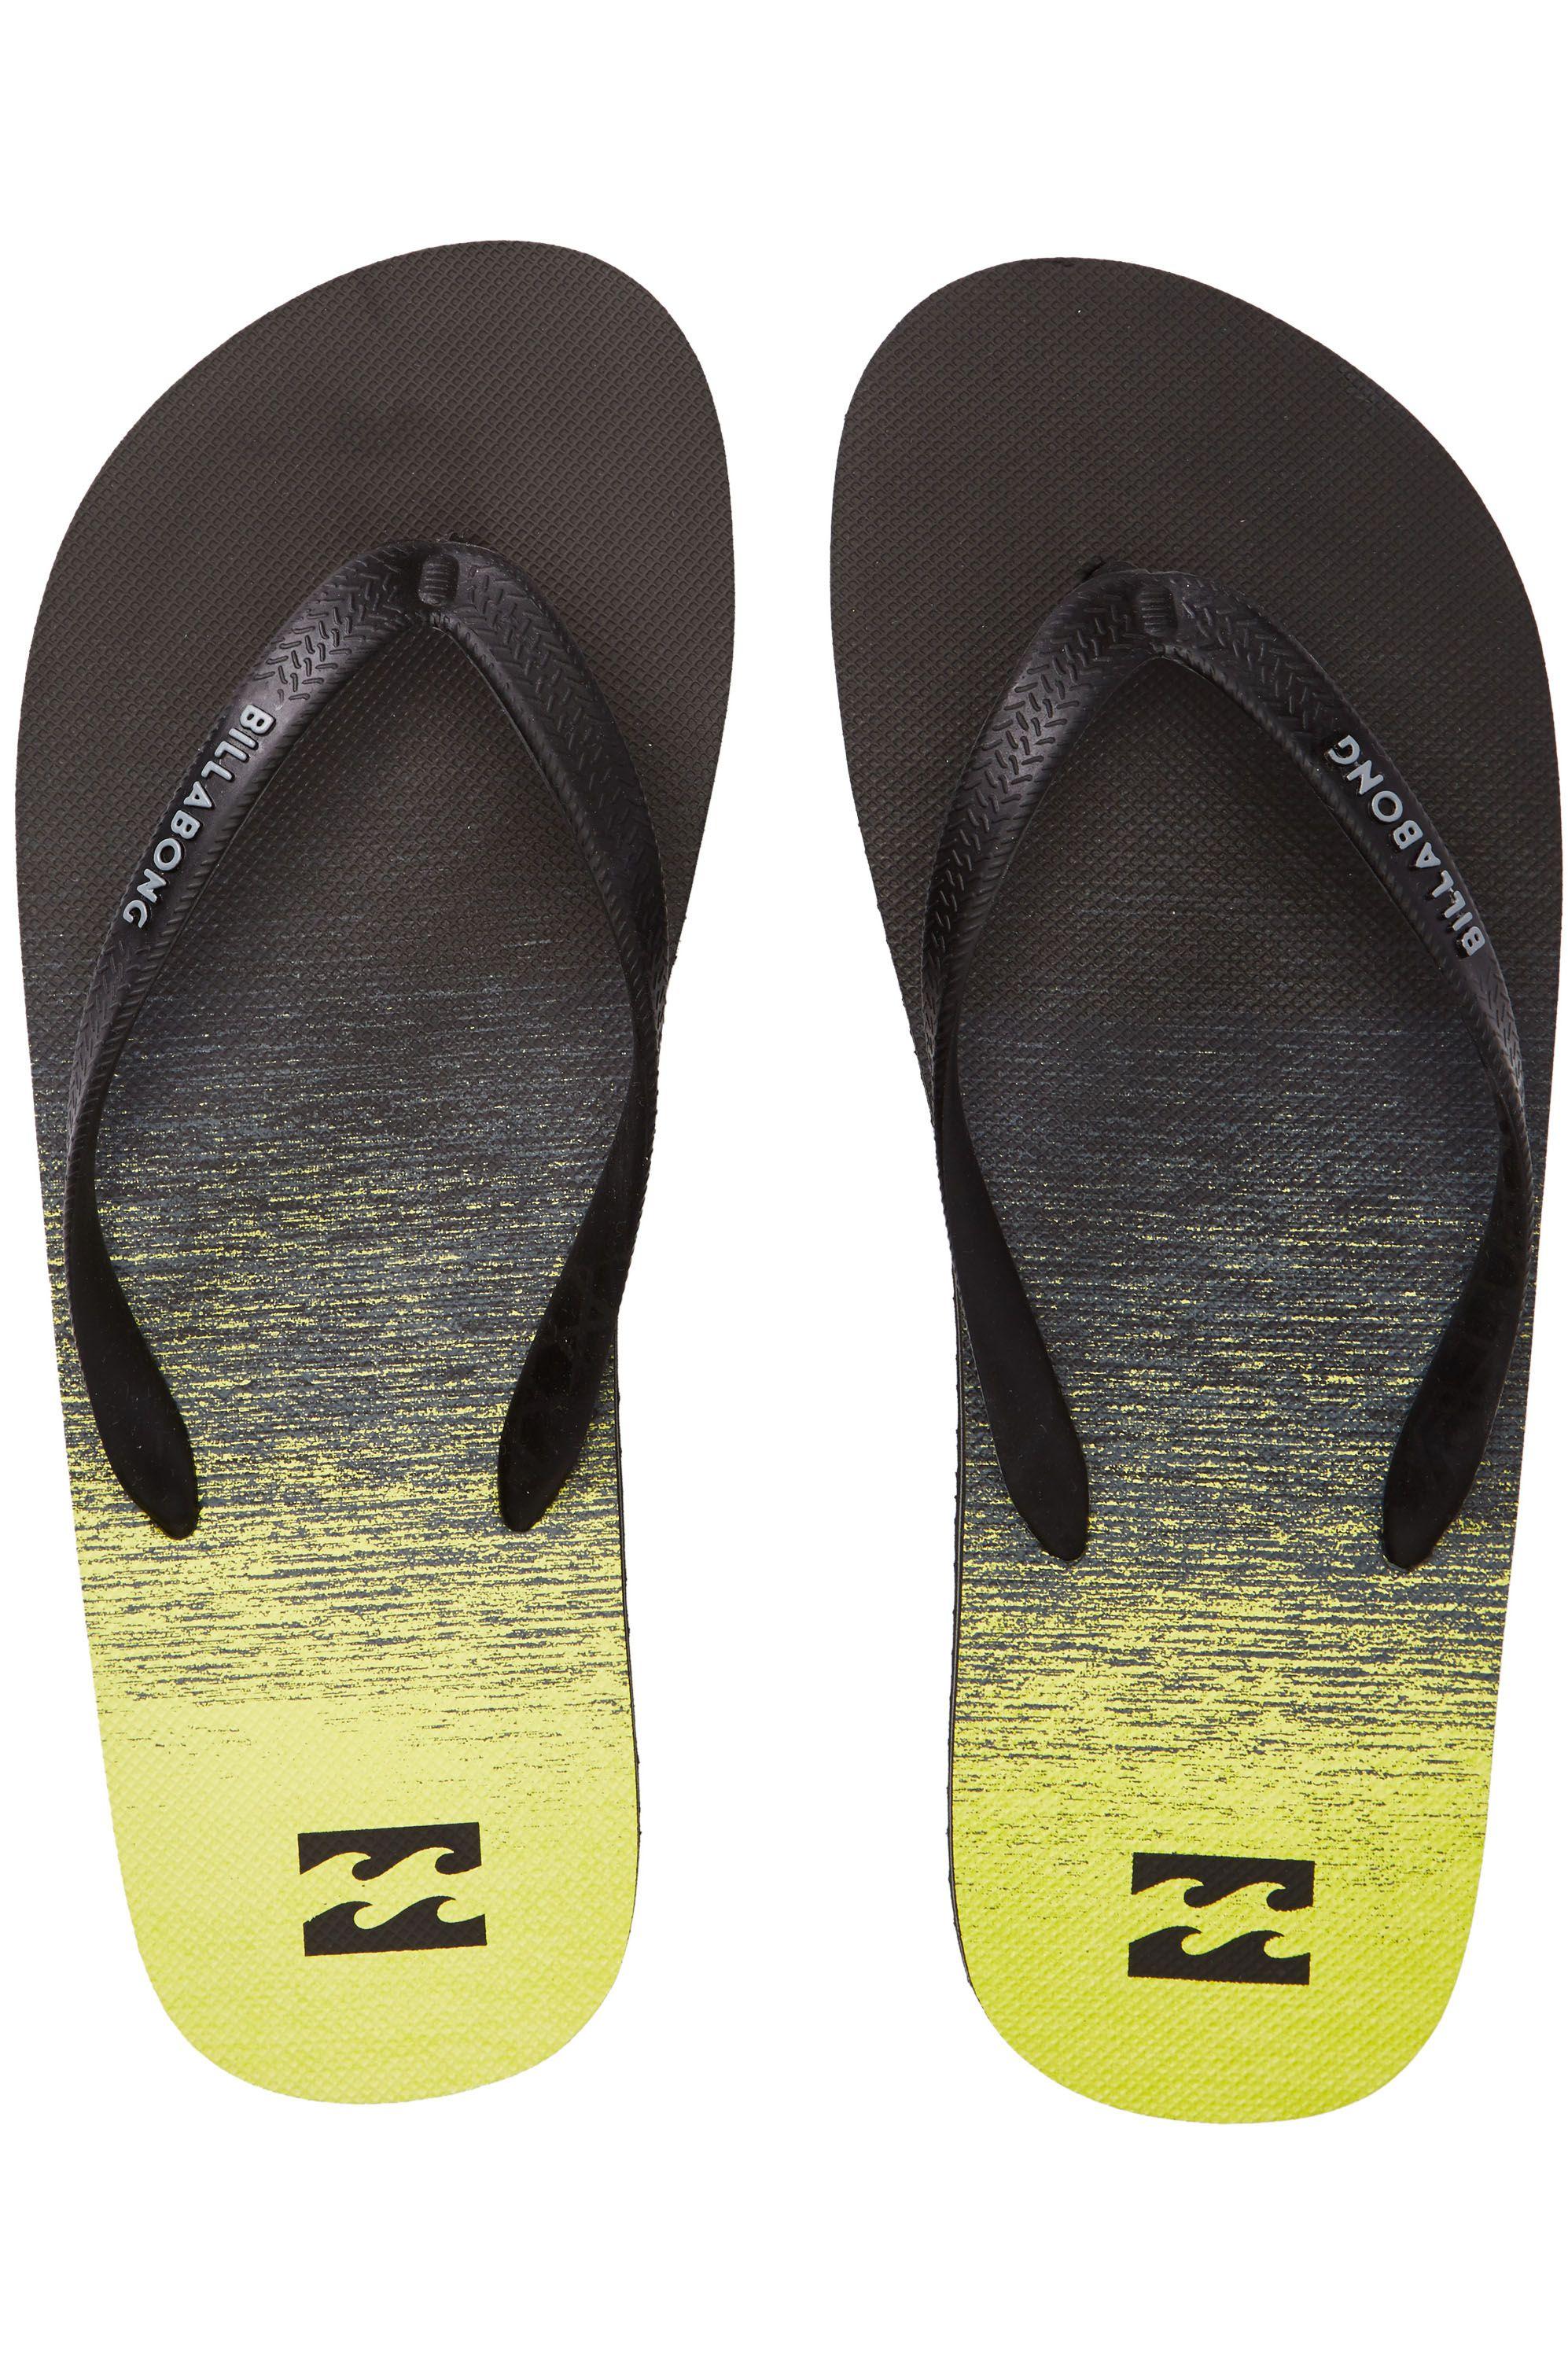 e5fd6d23a62a Billabong Sandals TIDES 73 STRIPES Neo Yellow